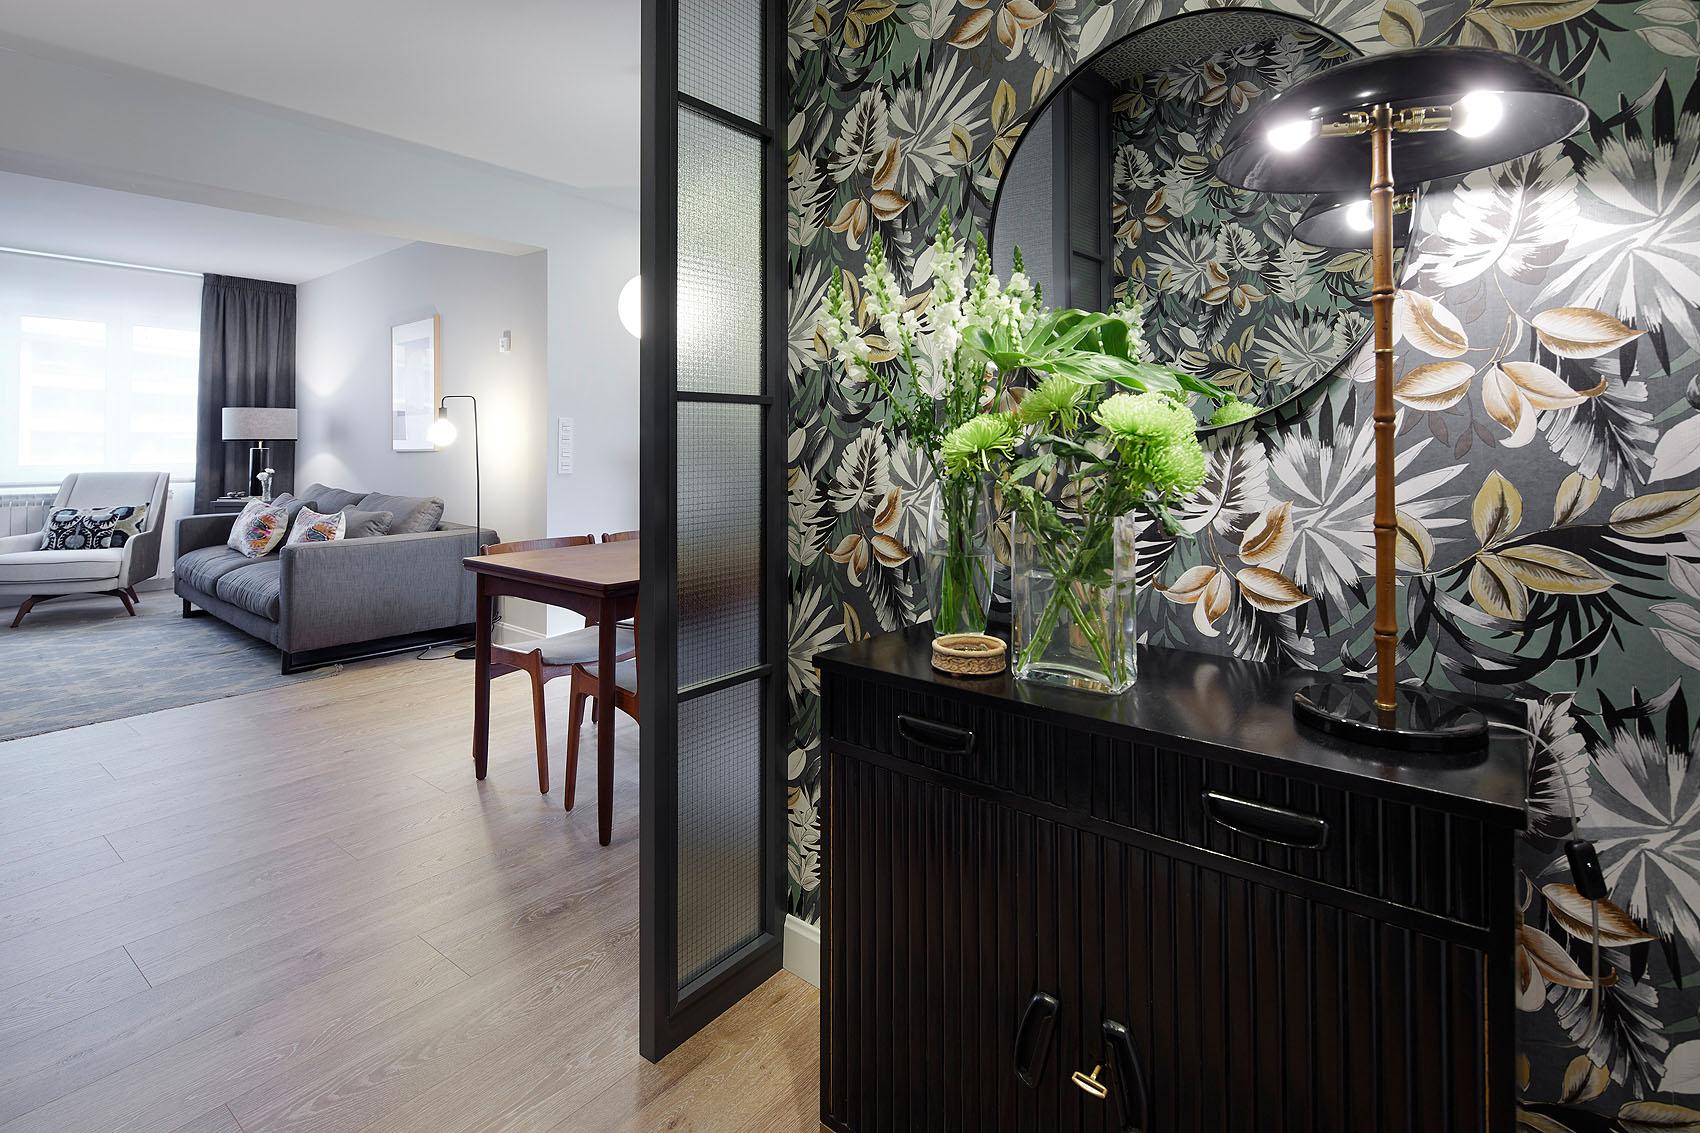 Apartamento en Renteria - Iñaki Caperochipi - Fotografía